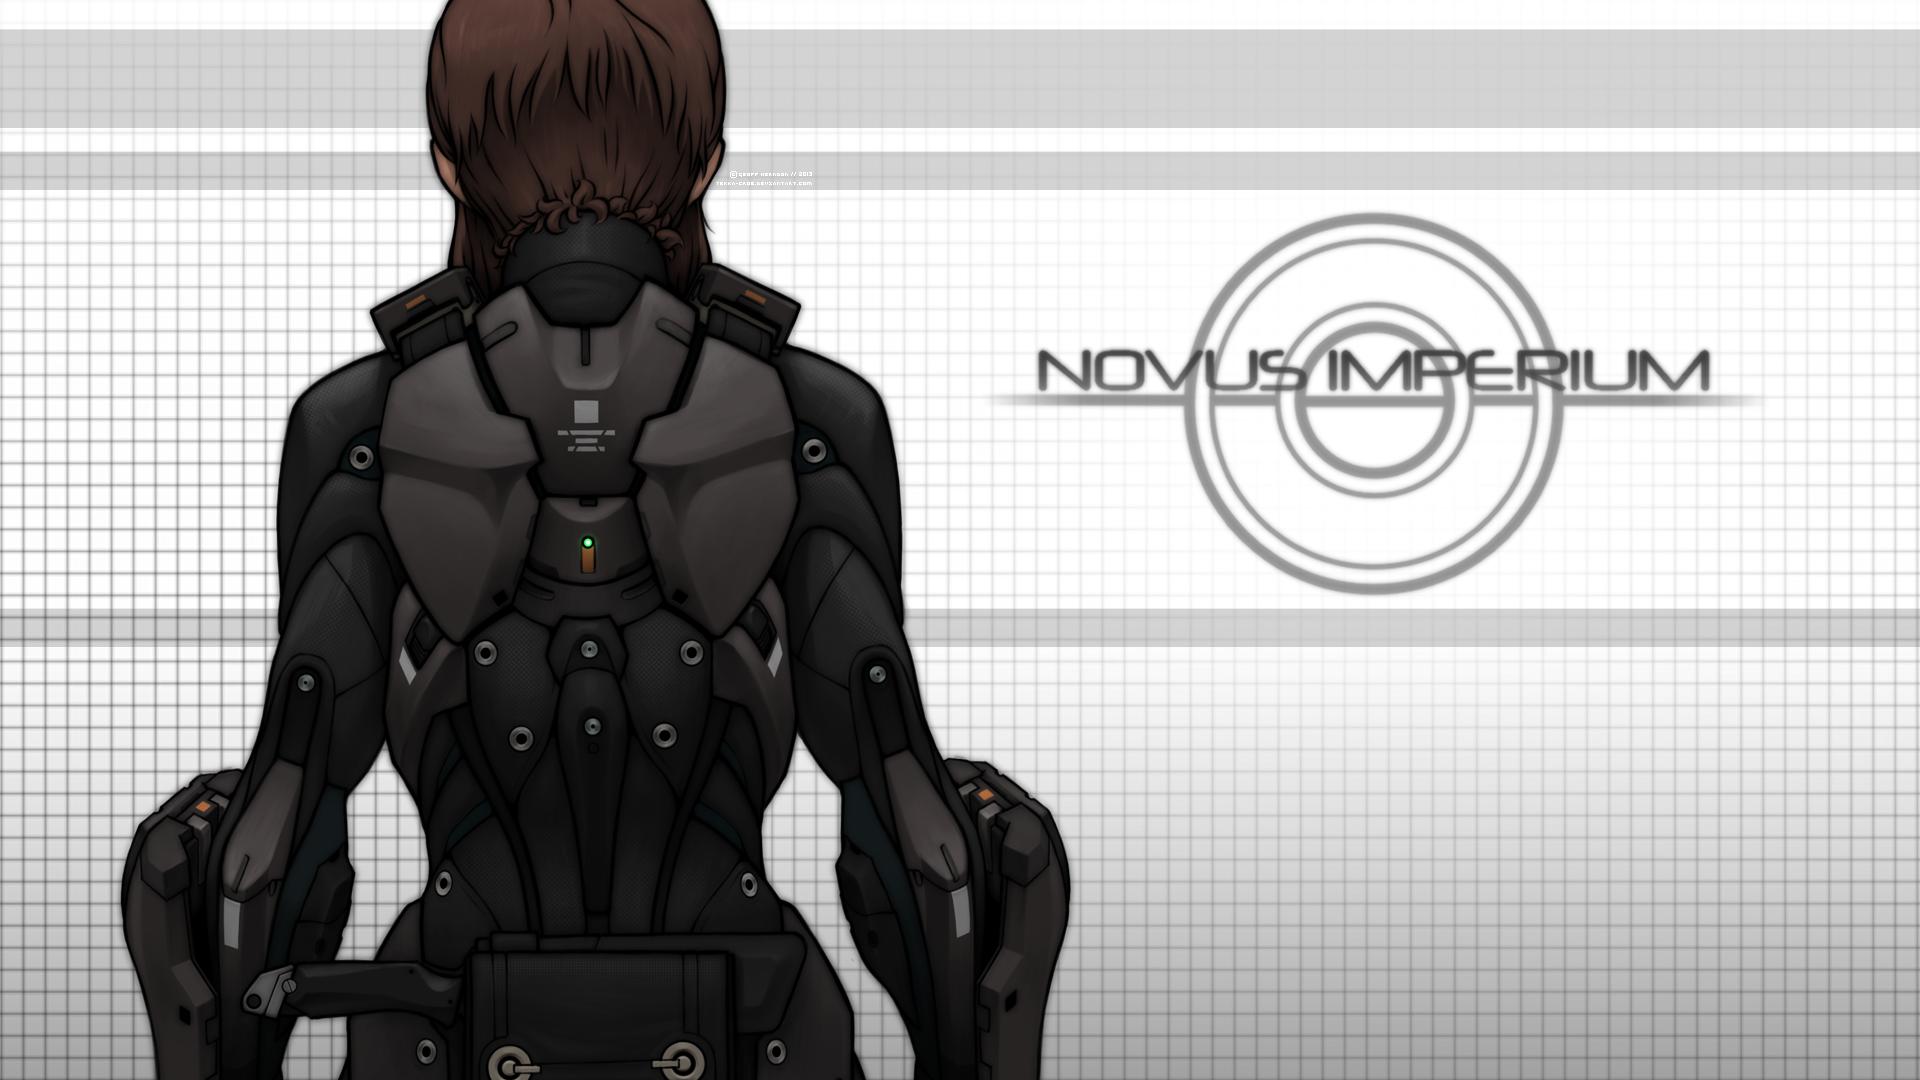 NI Desktop / Reina Armor Study by Tekka-Croe